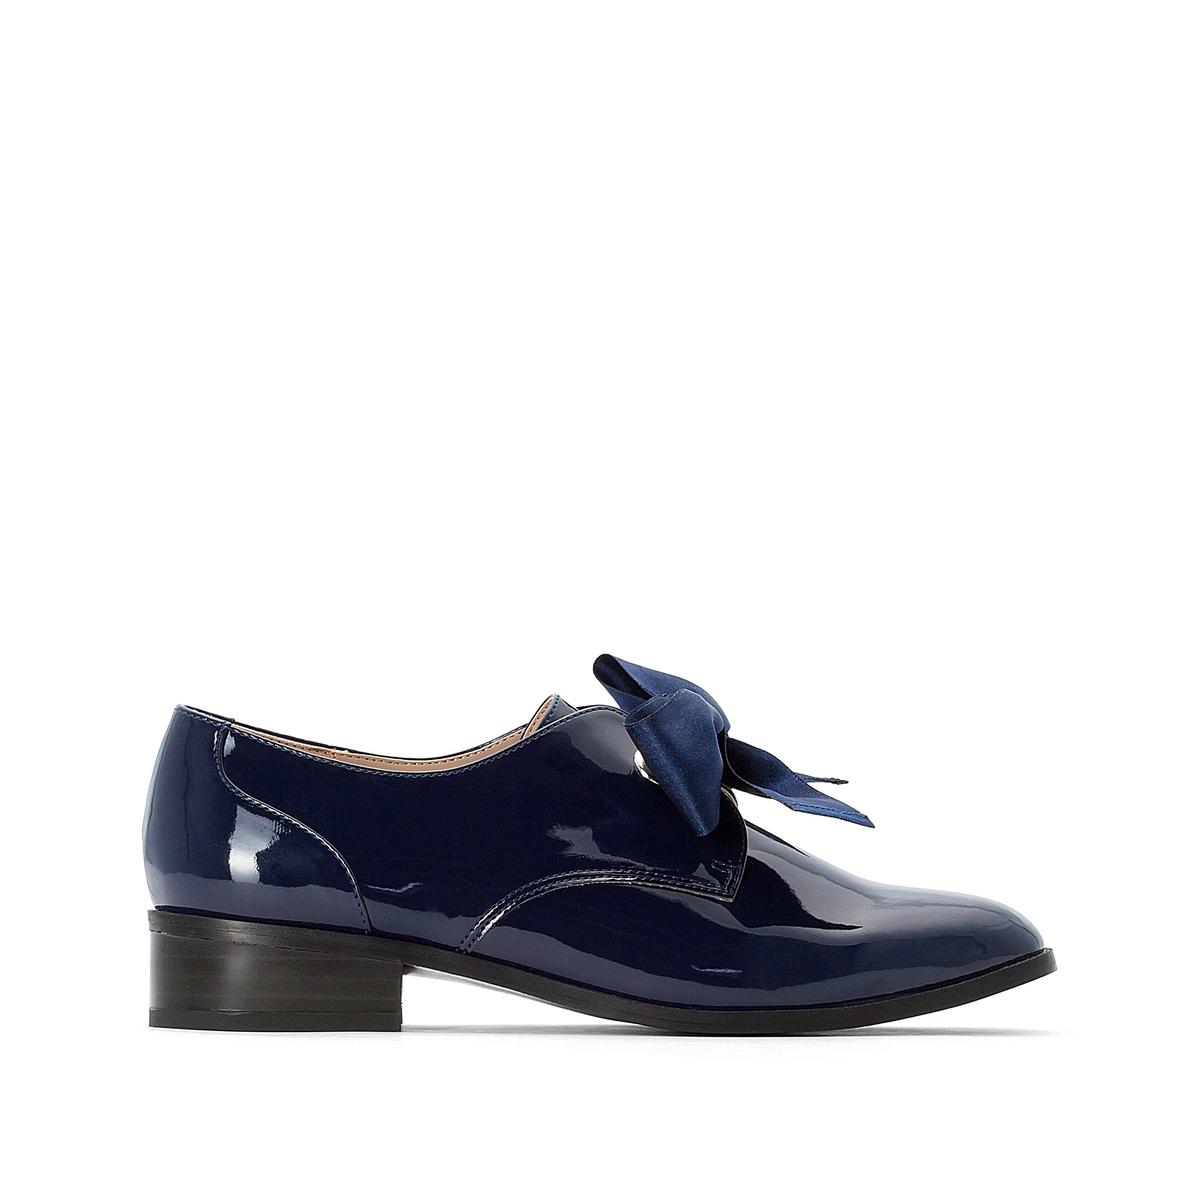 Ботинки-дерби La Redoute На шнуровке из лент 38 синий